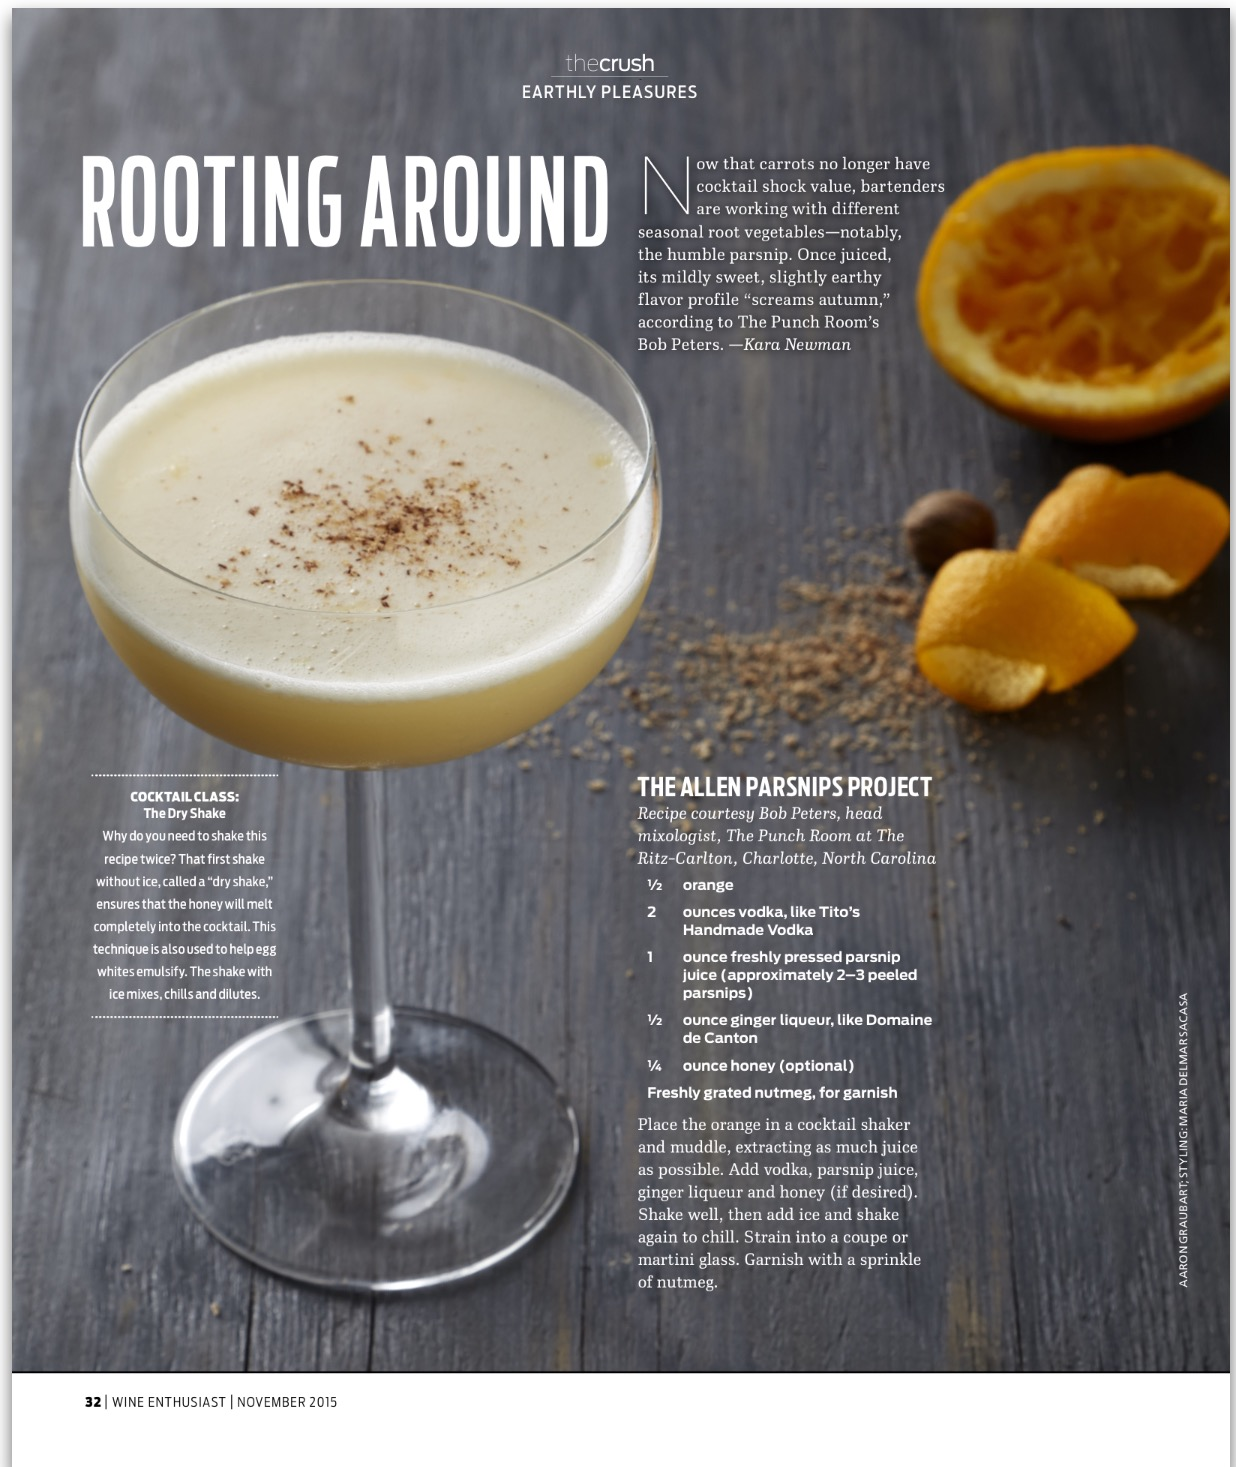 Rooting Around